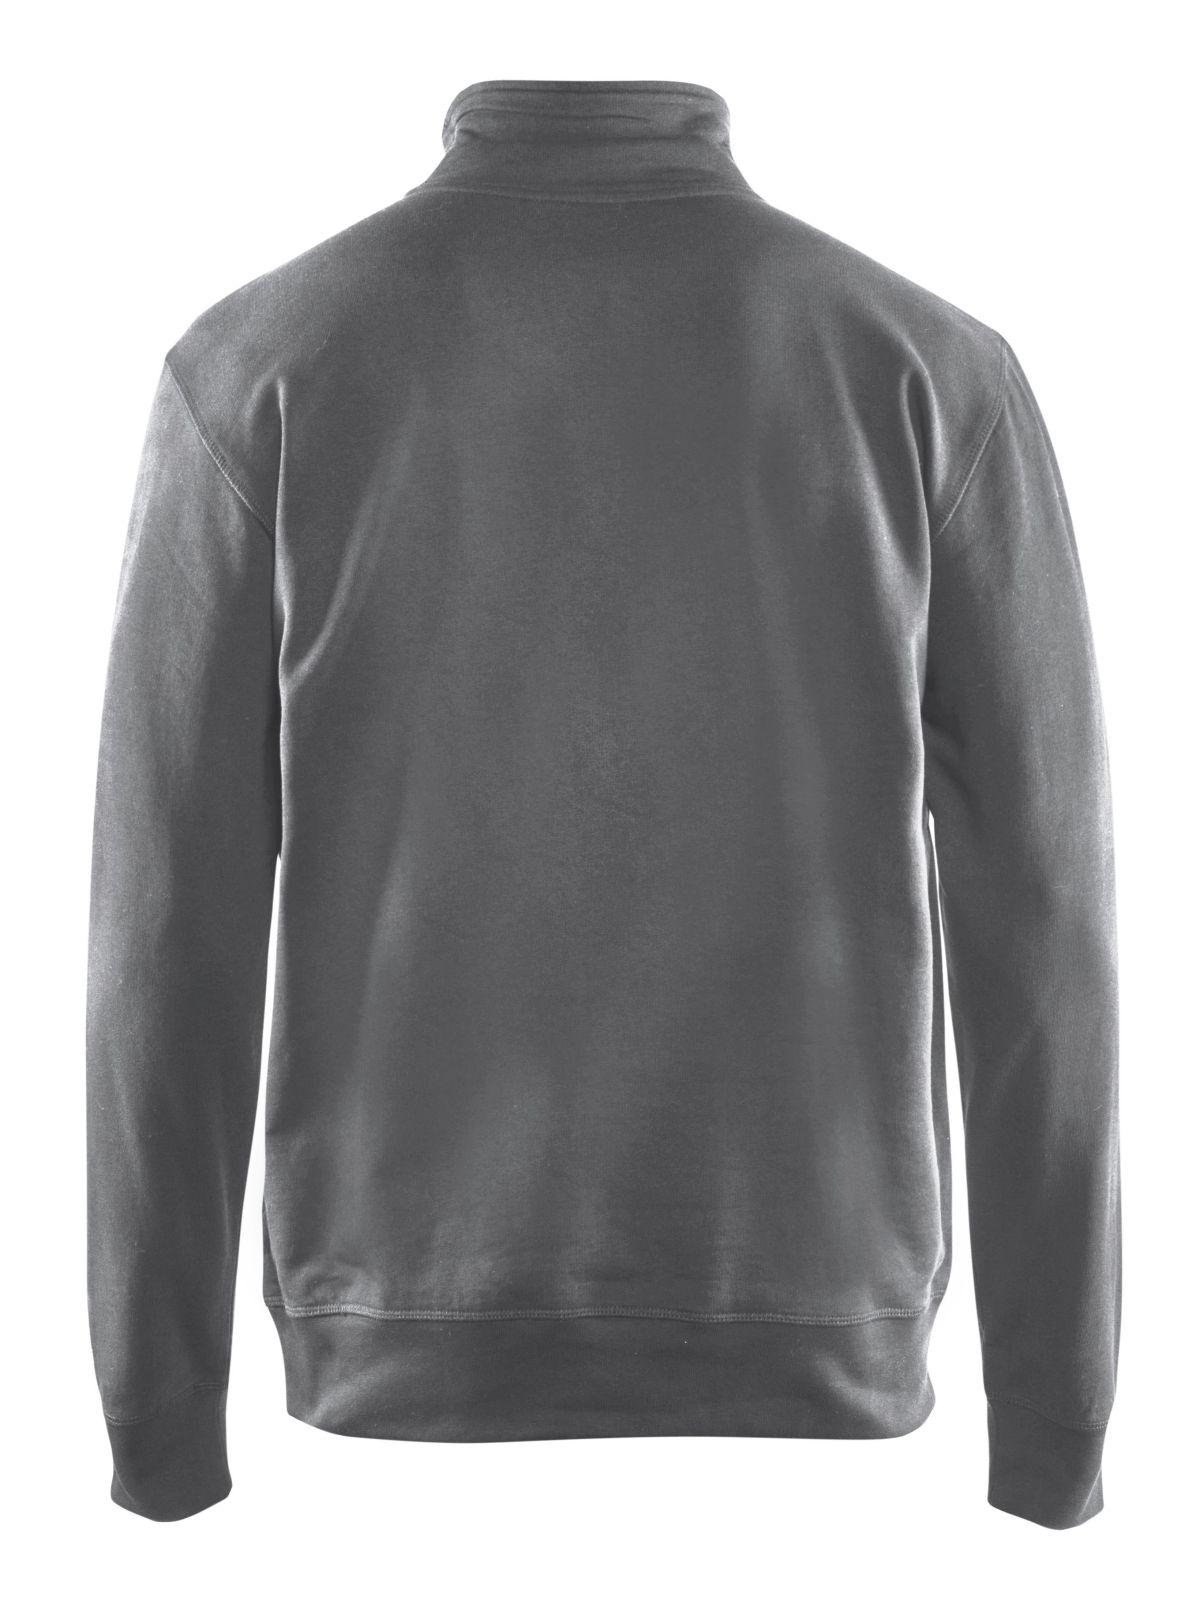 Blaklader Sweatshirts 33691158 grijs(9400)